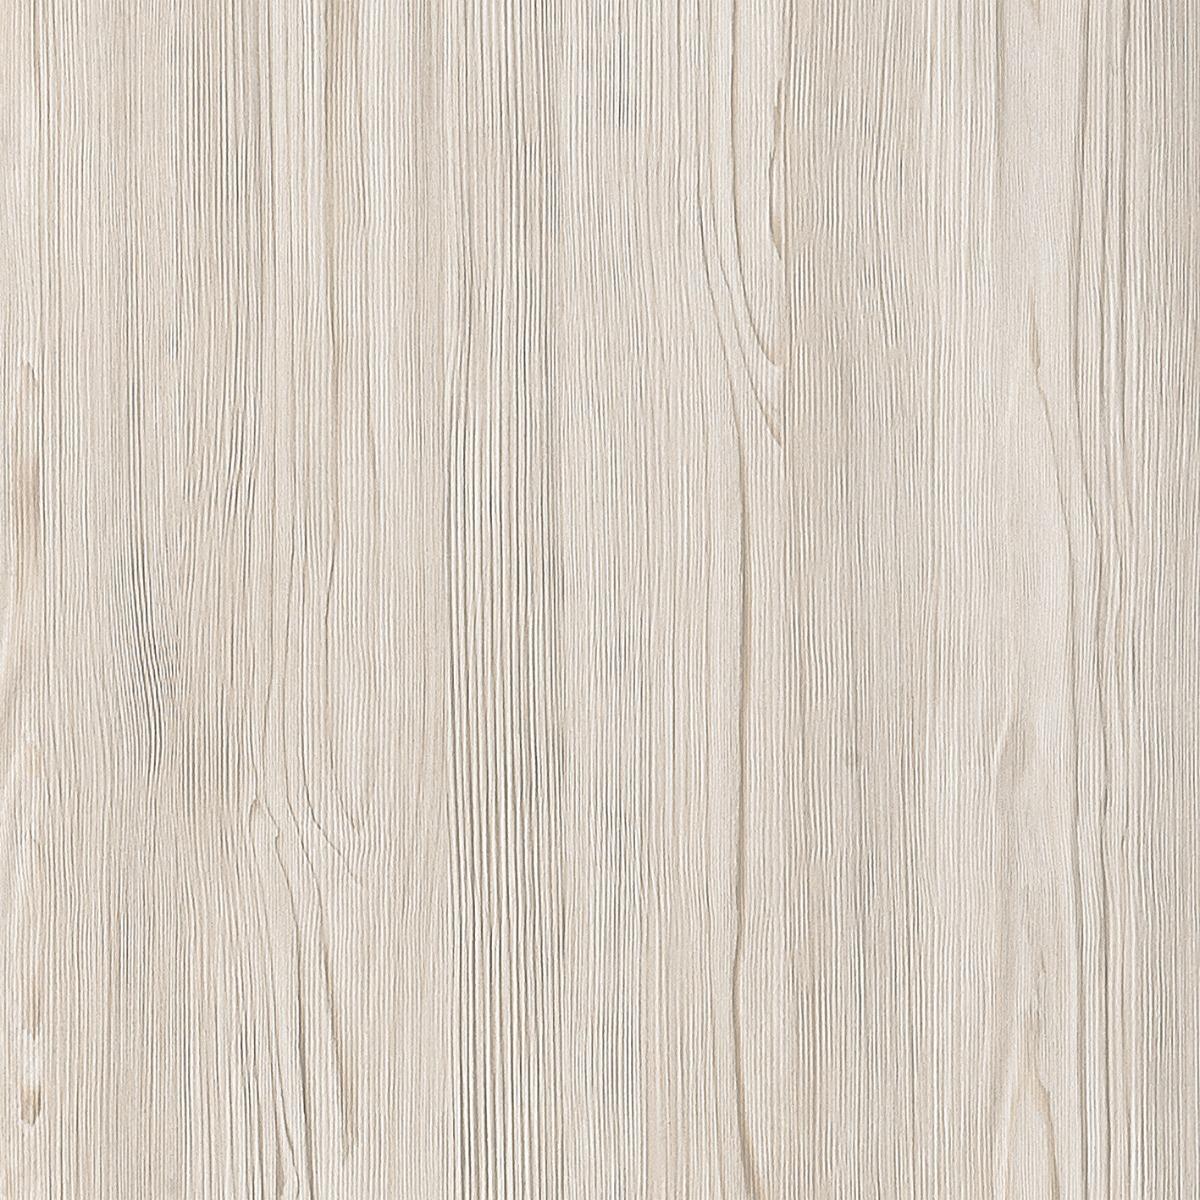 GFT BDF Natural Maple Wood